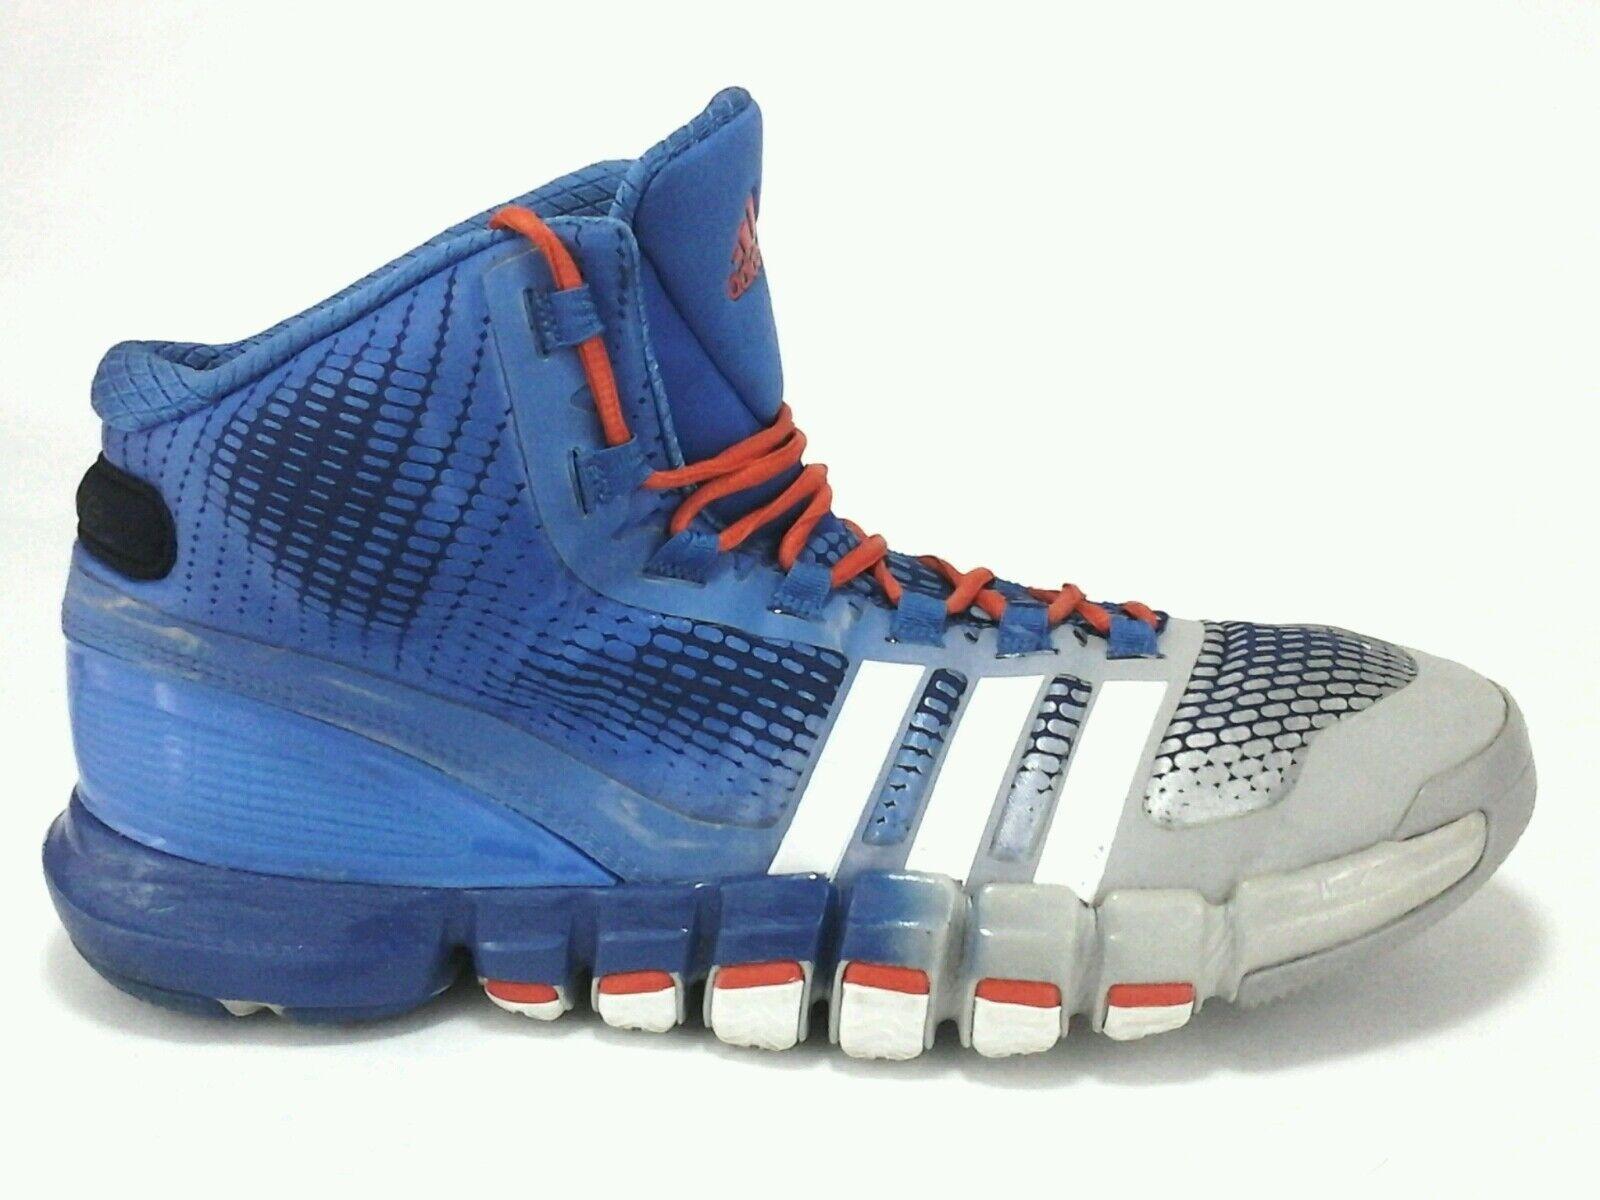 Adidas adipure mens crazyquick basketball schuhe - schuhe basketball blaue uns 14. 8e36b8